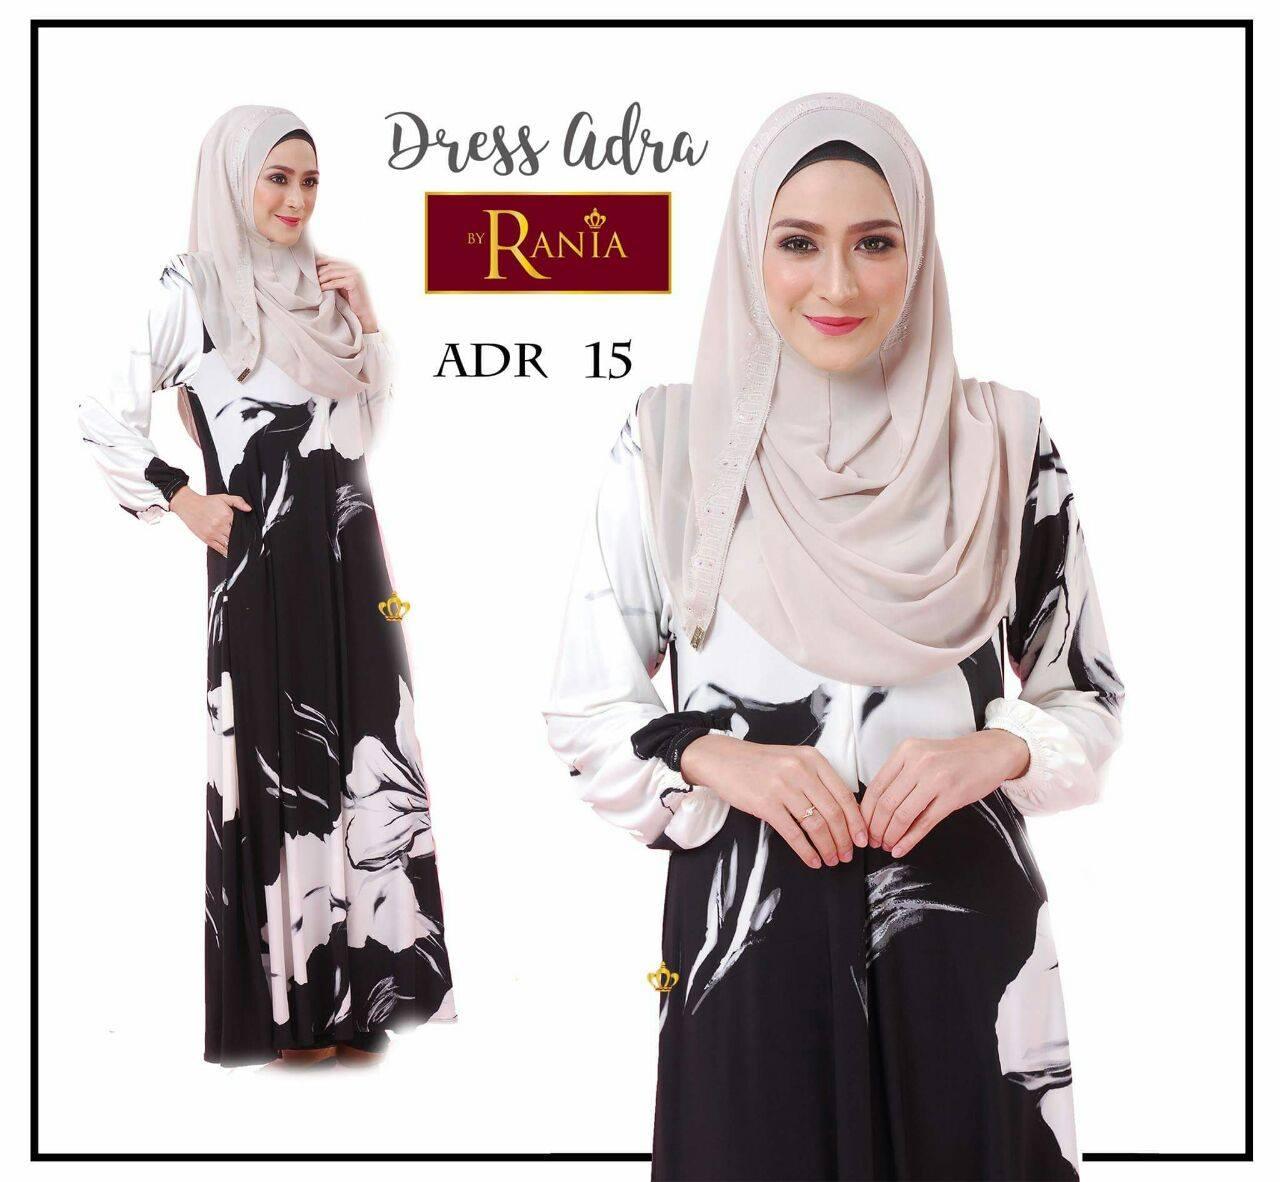 jubah-lycra-adra-adr015